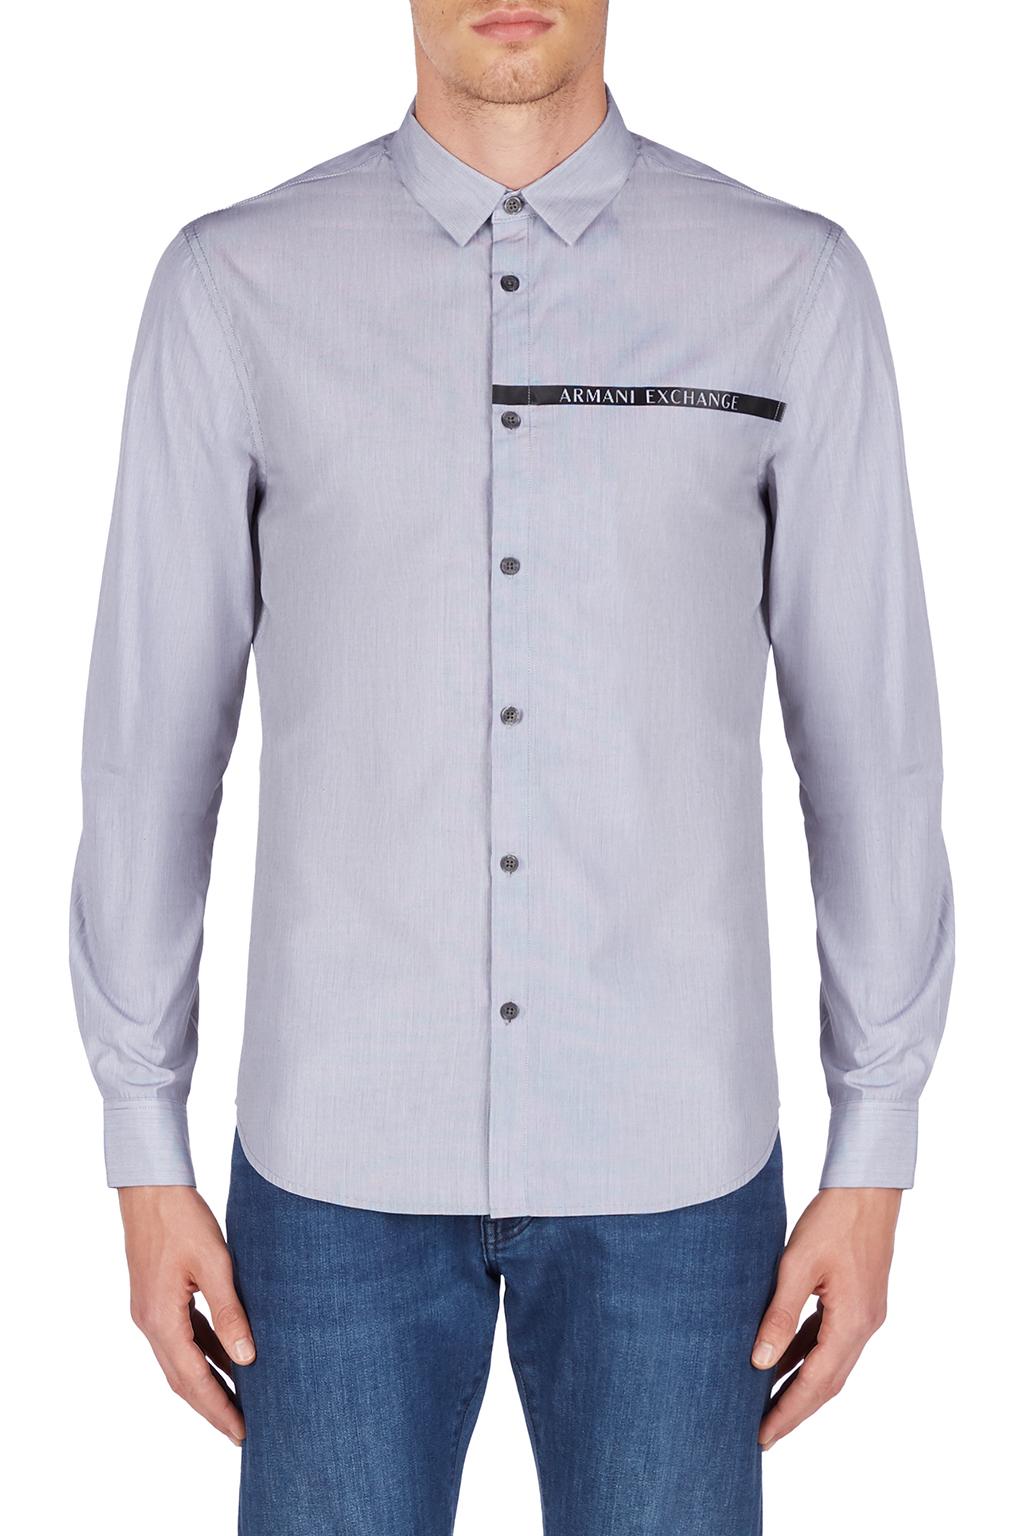 Camicia uomo ARMANI EXCHANGE regular fit